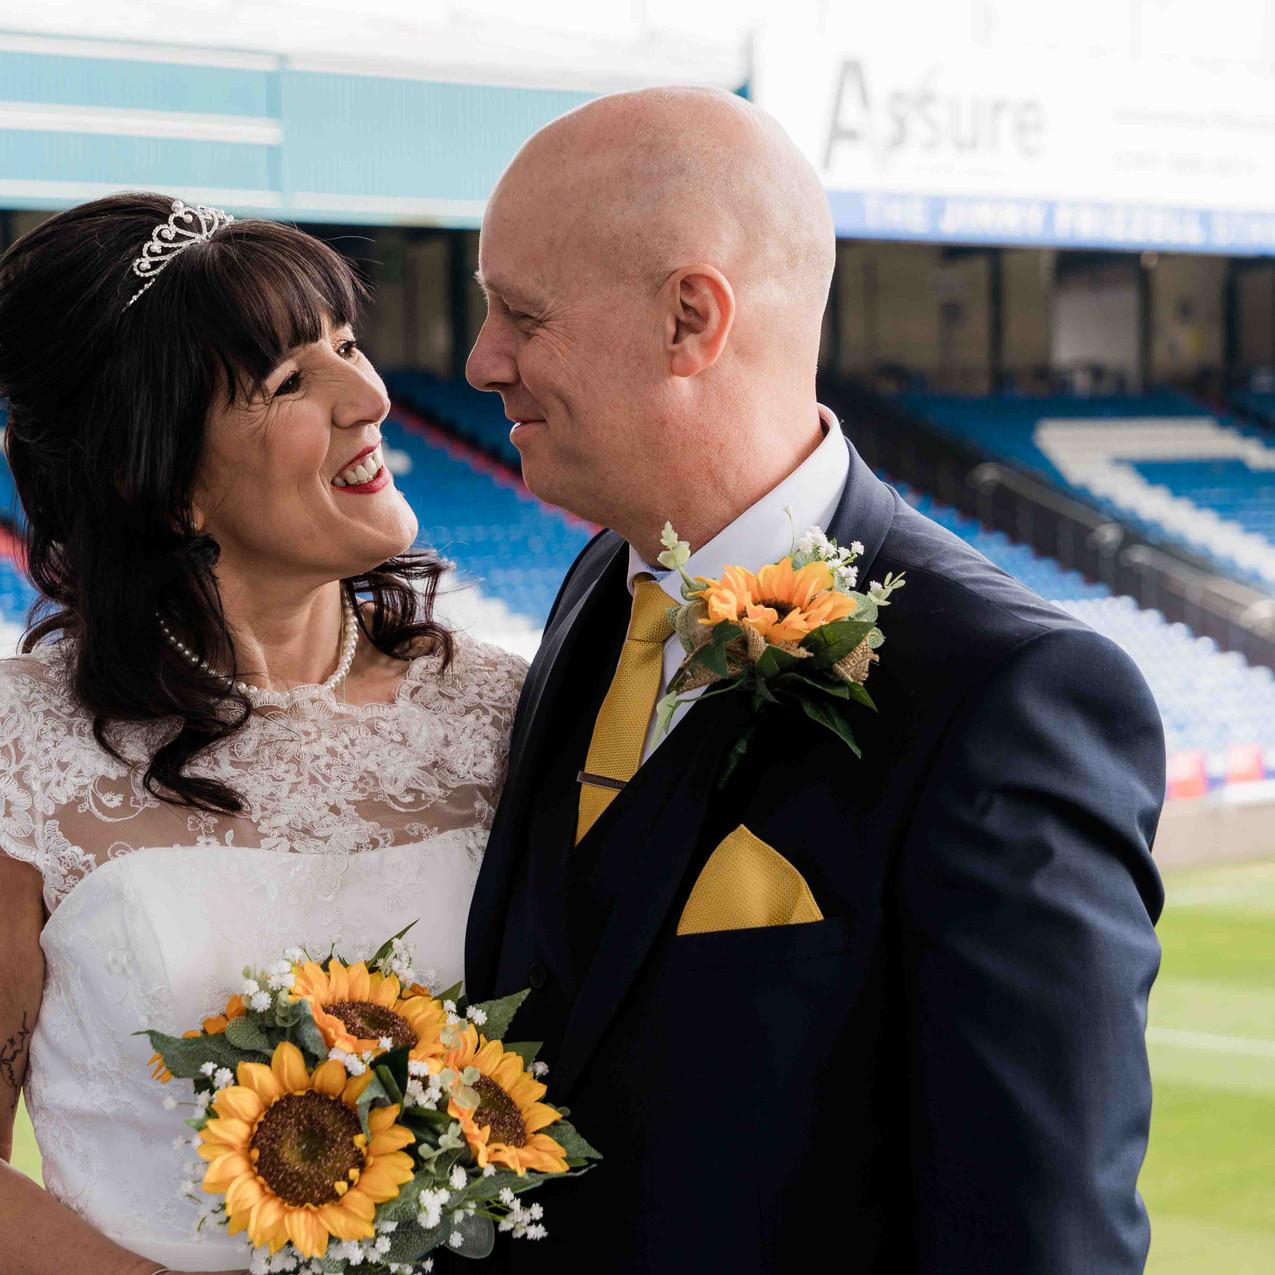 Football pitch wedding photo